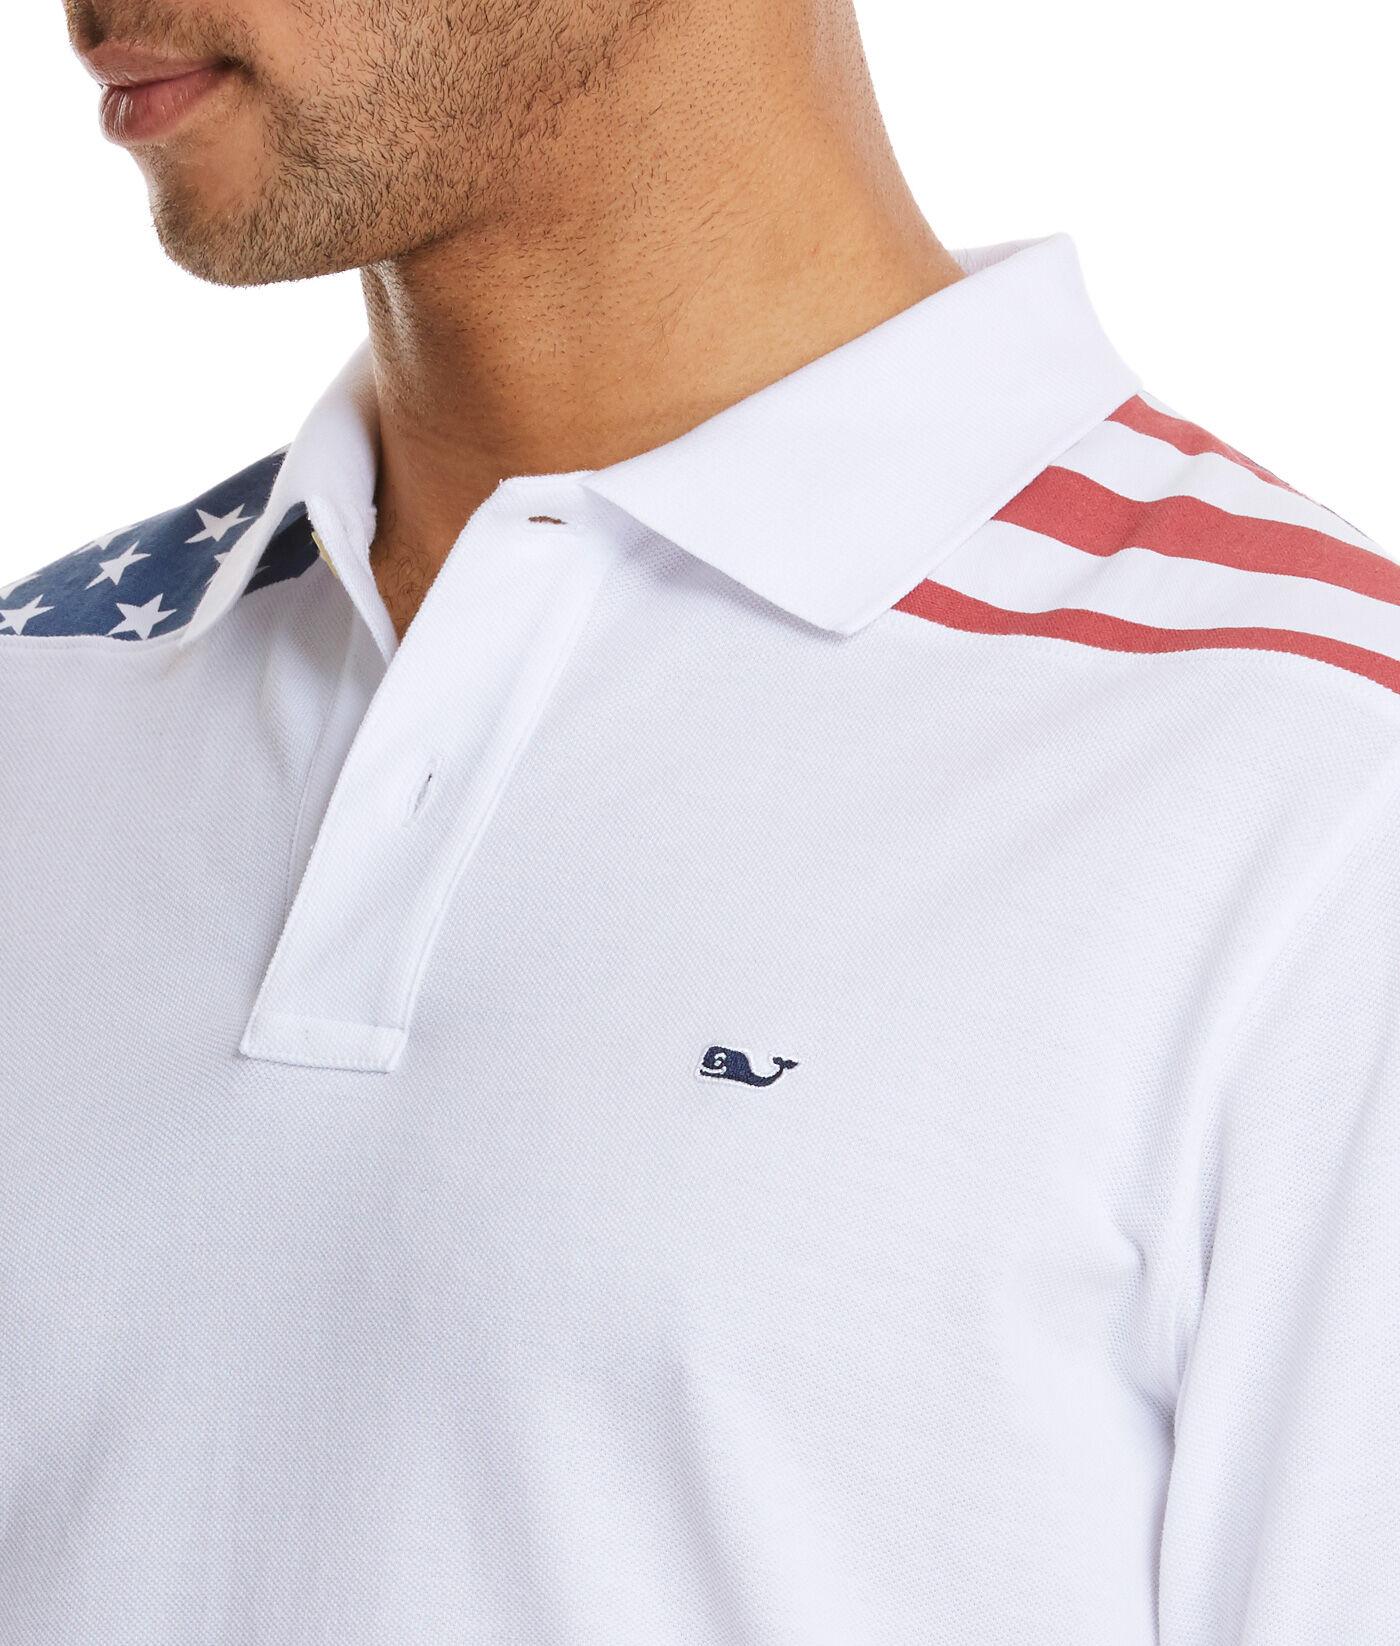 international flag shirt flag golf shirts